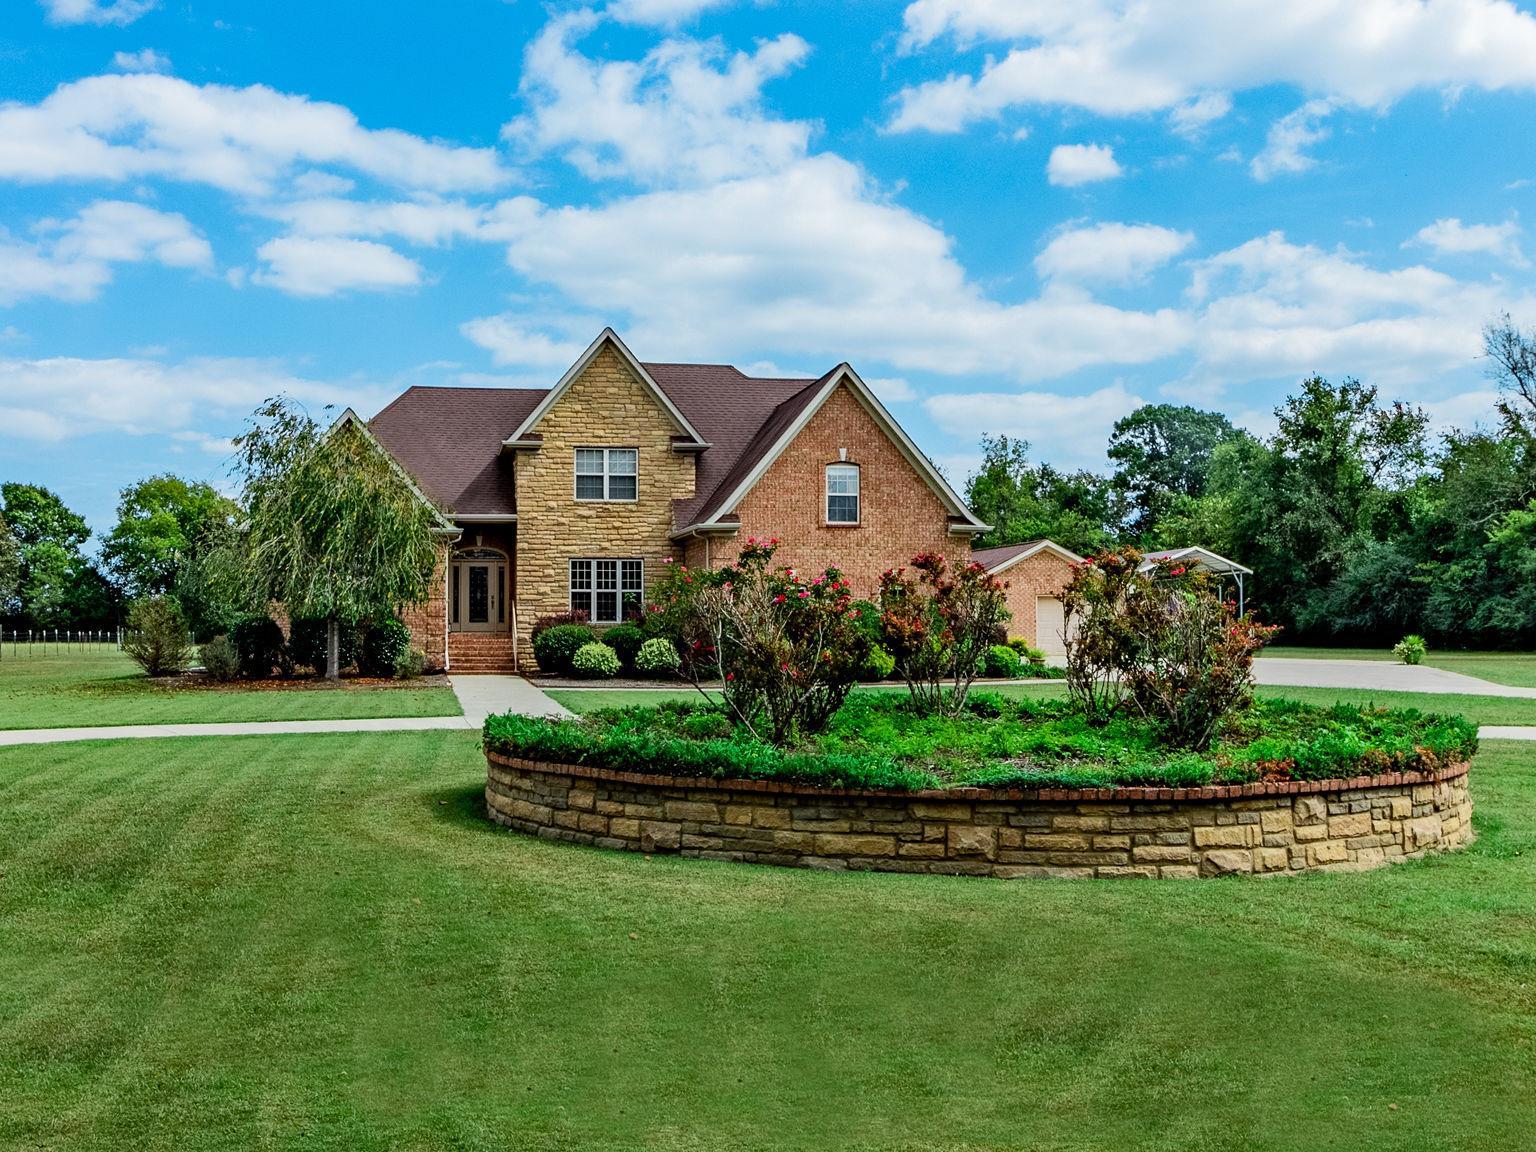 8759 Christiana Fosterville Rd, Christiana, TN 37037 - Christiana, TN real estate listing